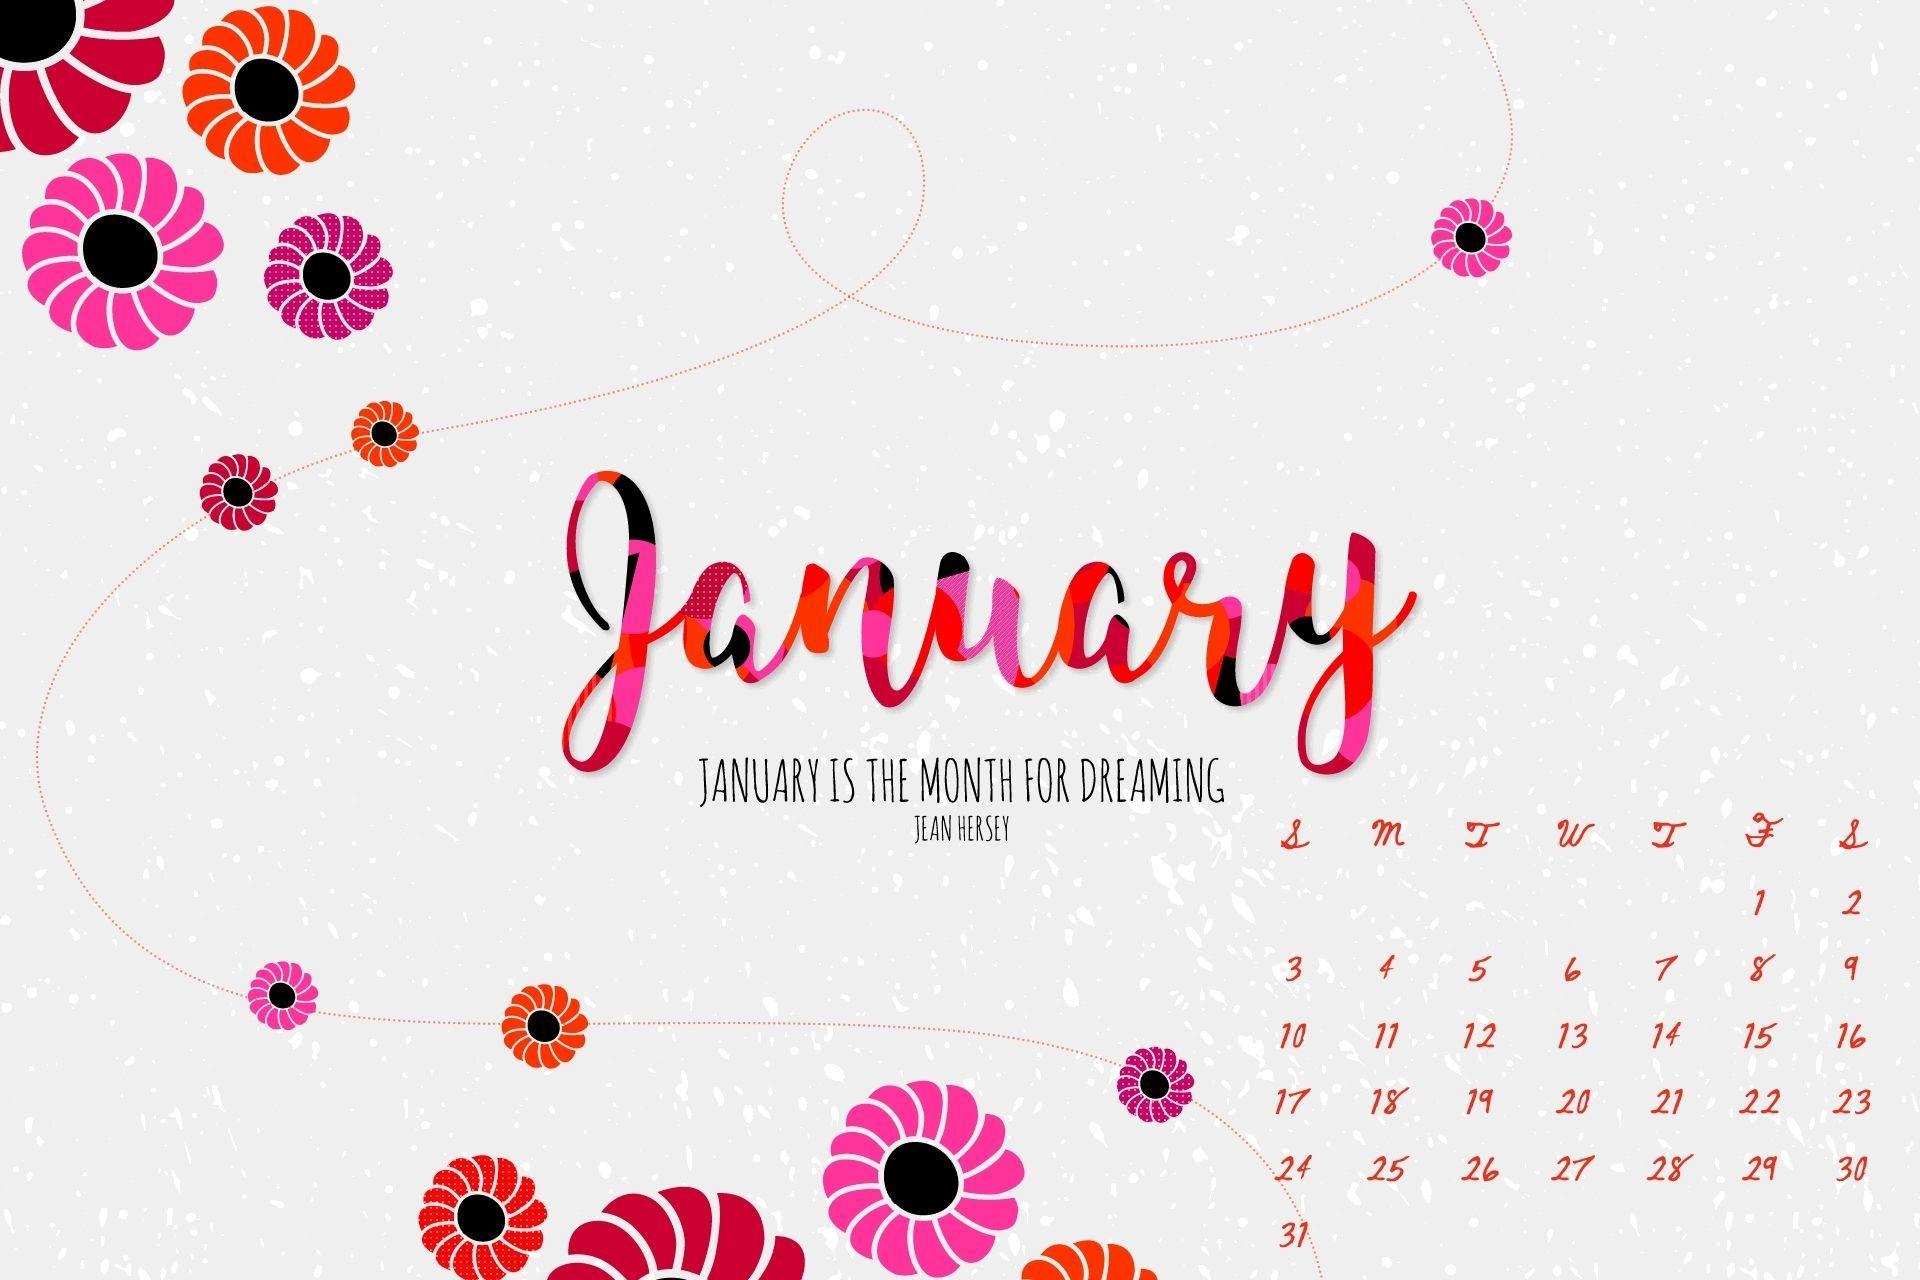 Calendar Wallpaper 2022.January Aesthetic Wallpaper Desktop 2021 Novocom Top